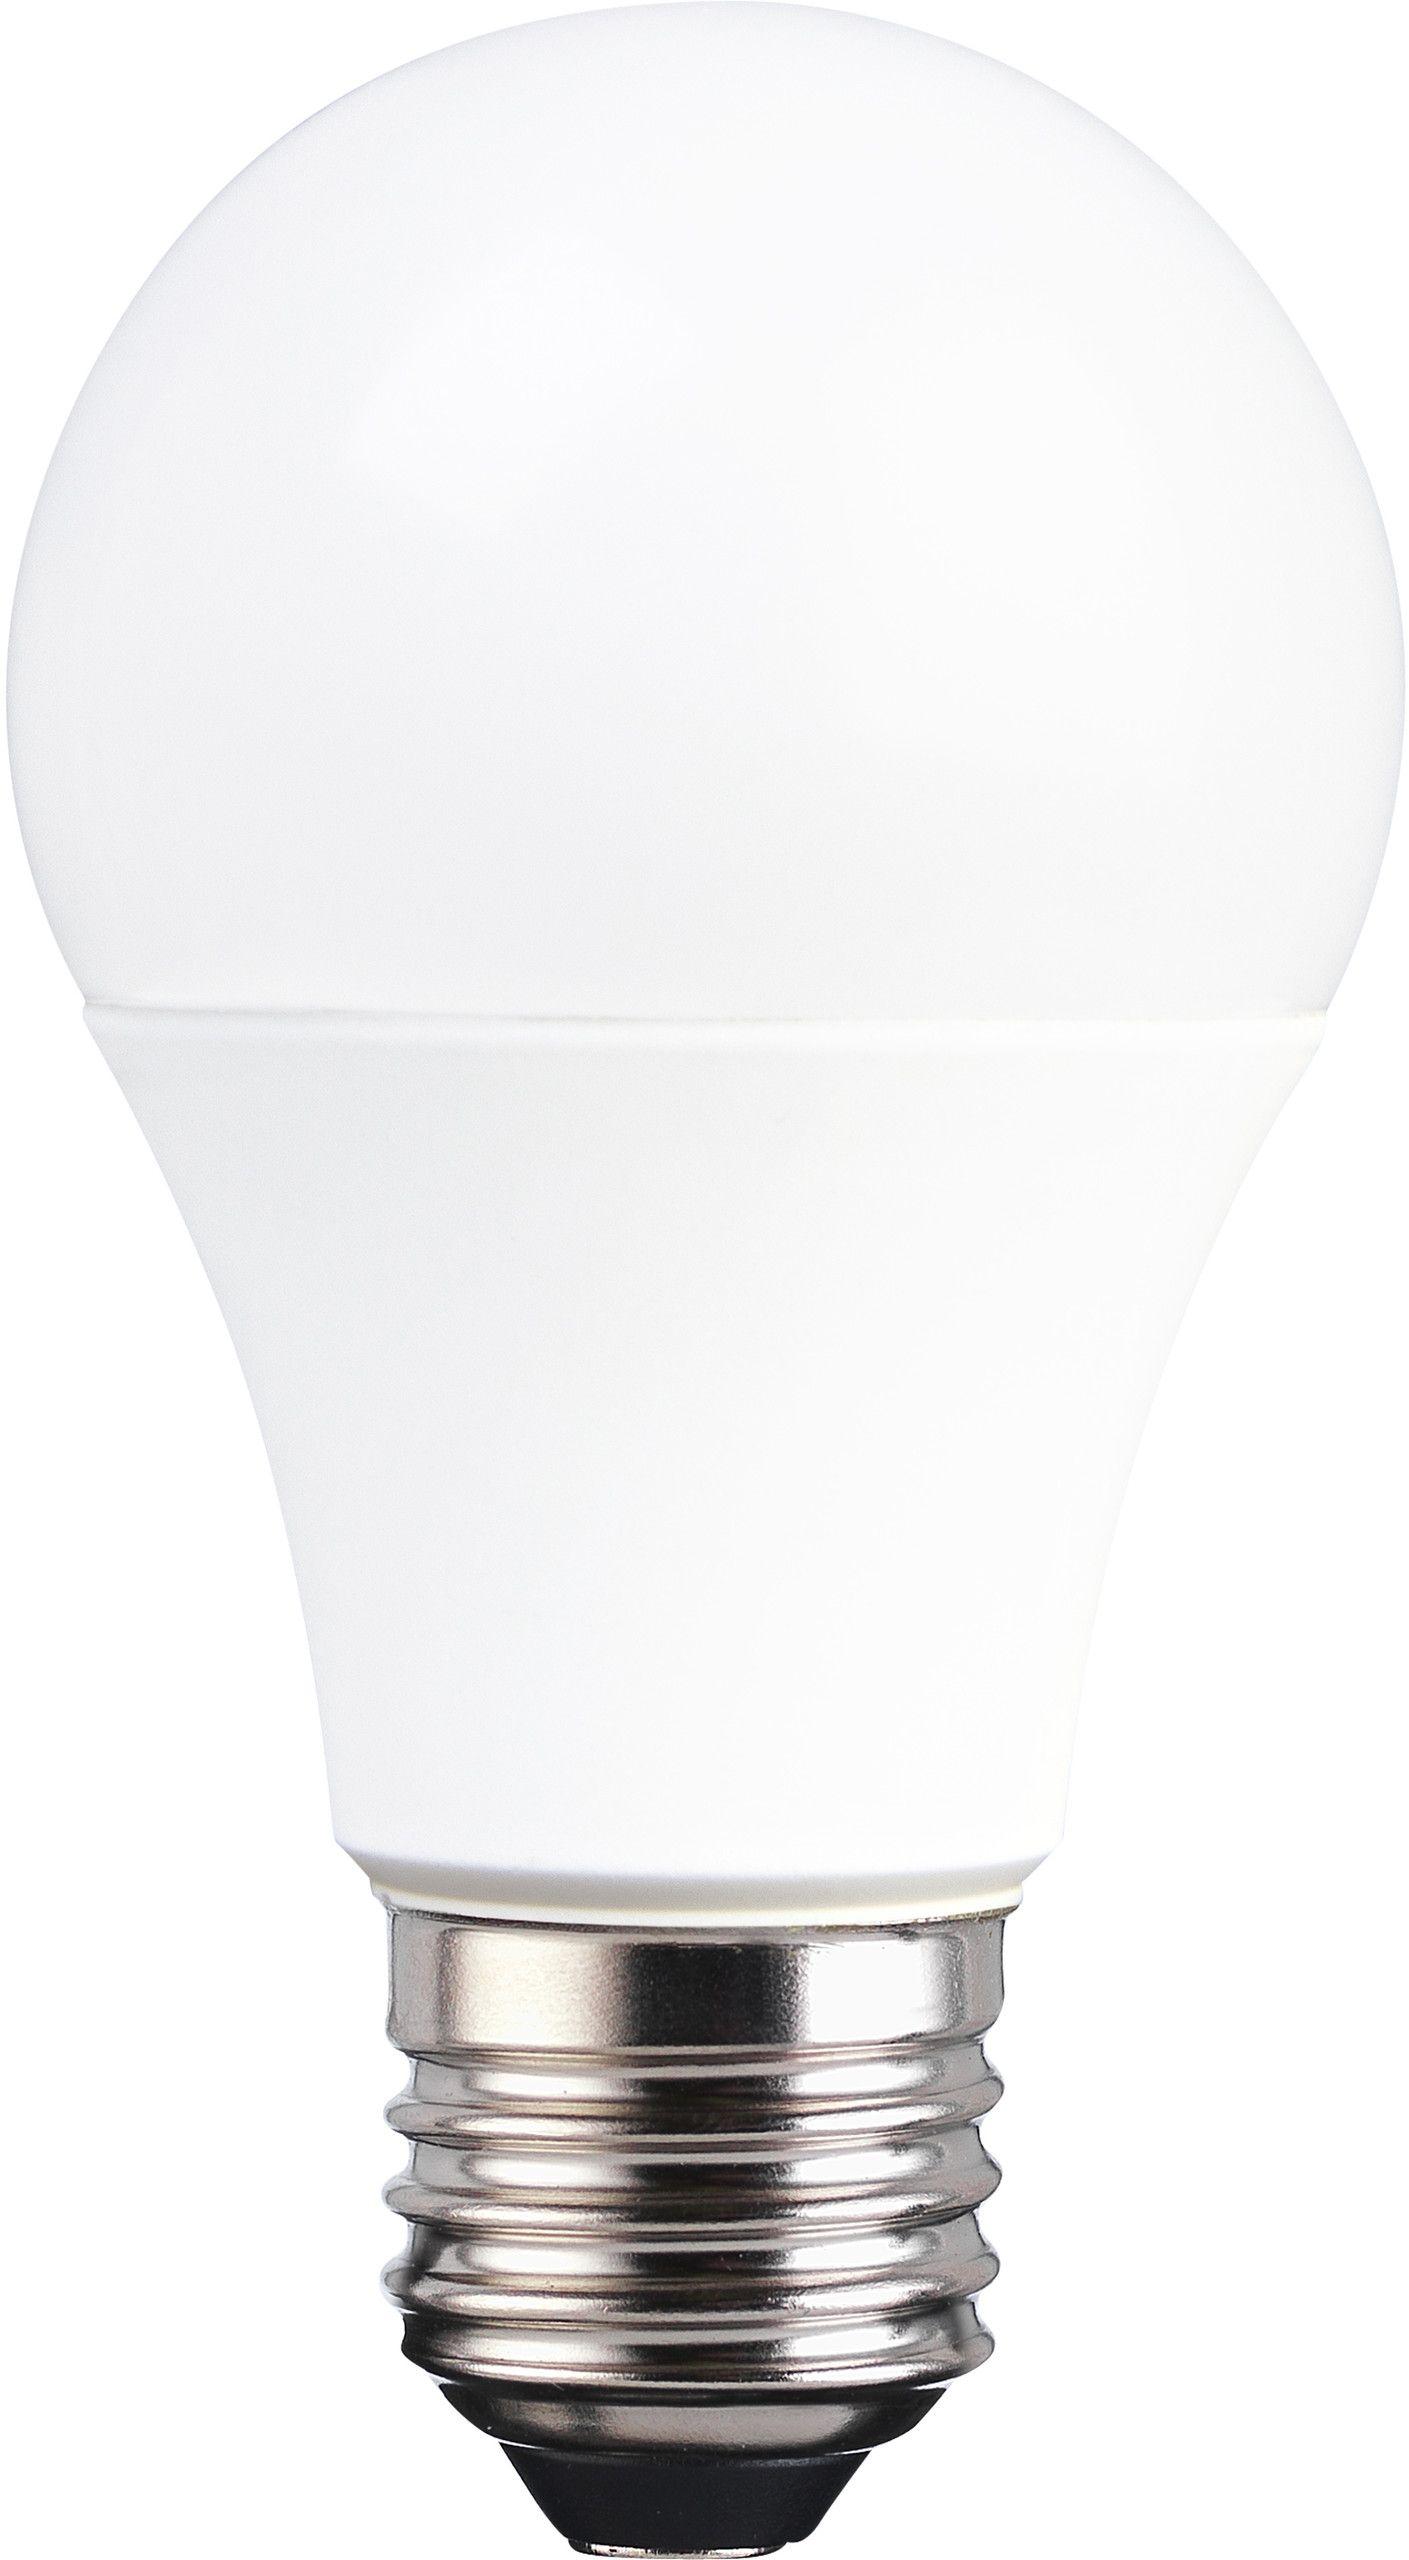 TCP Smart LED Lamp Classic CCT E27